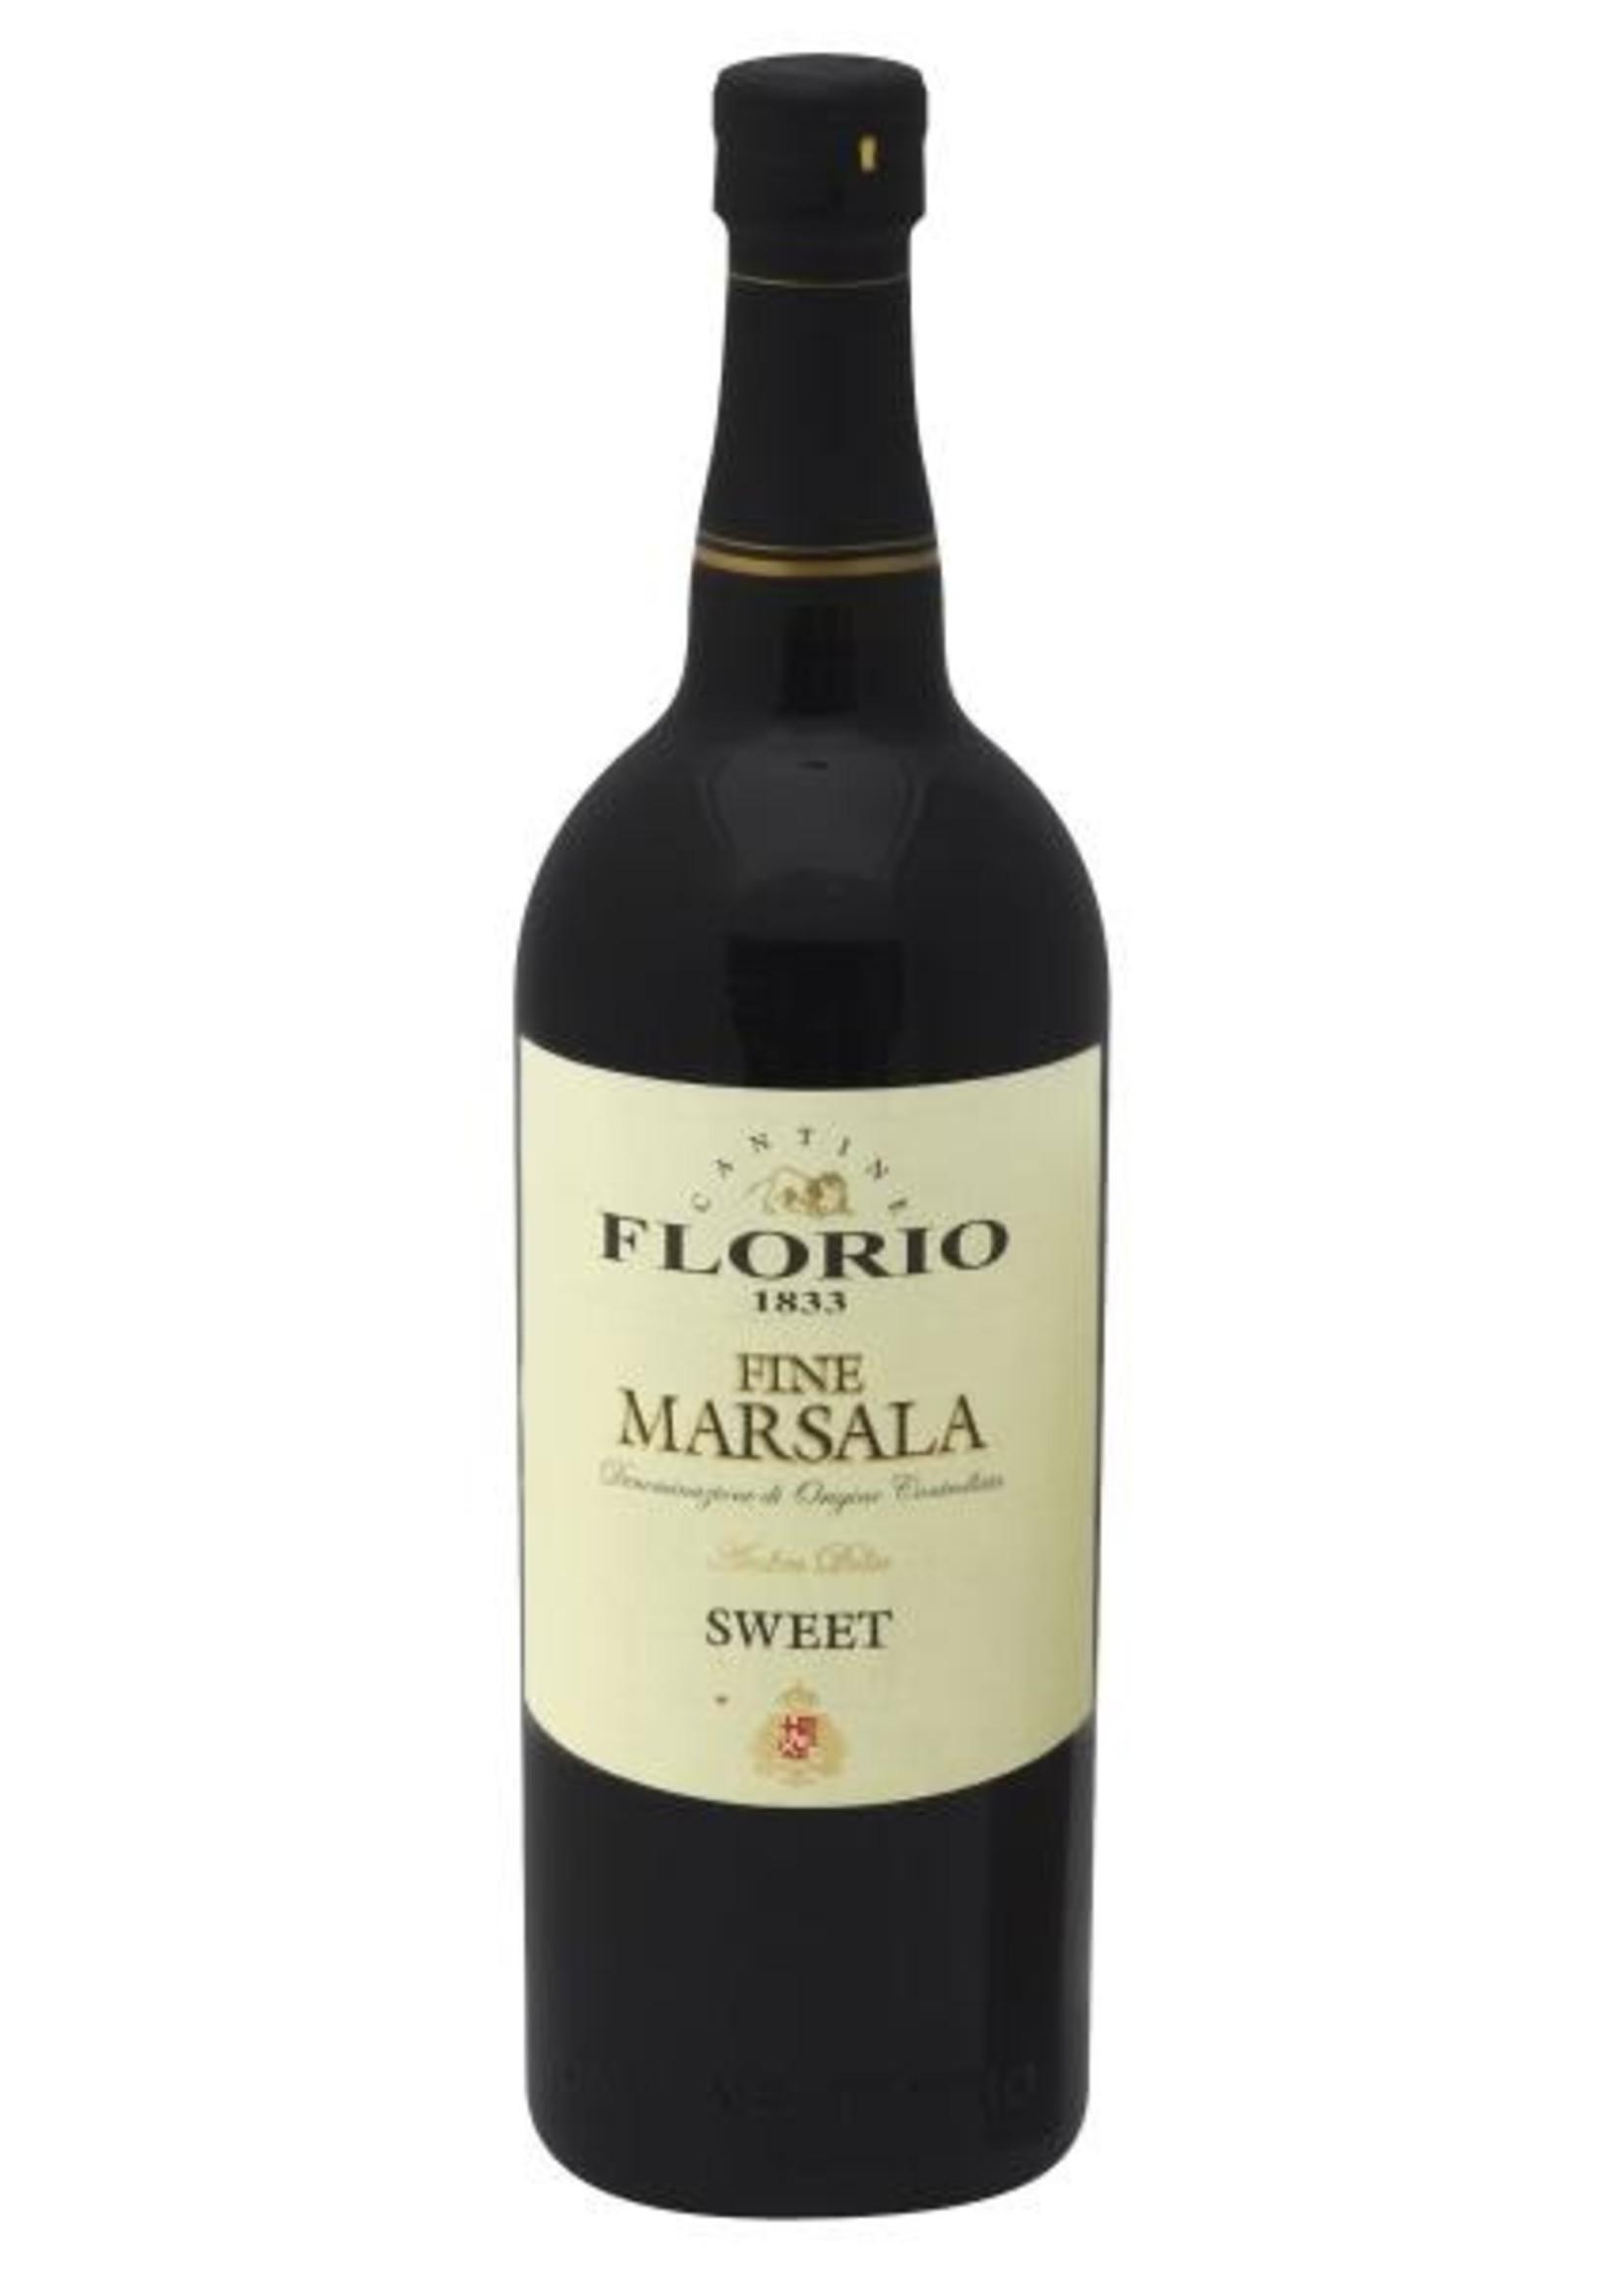 Florio Sweet Marsala